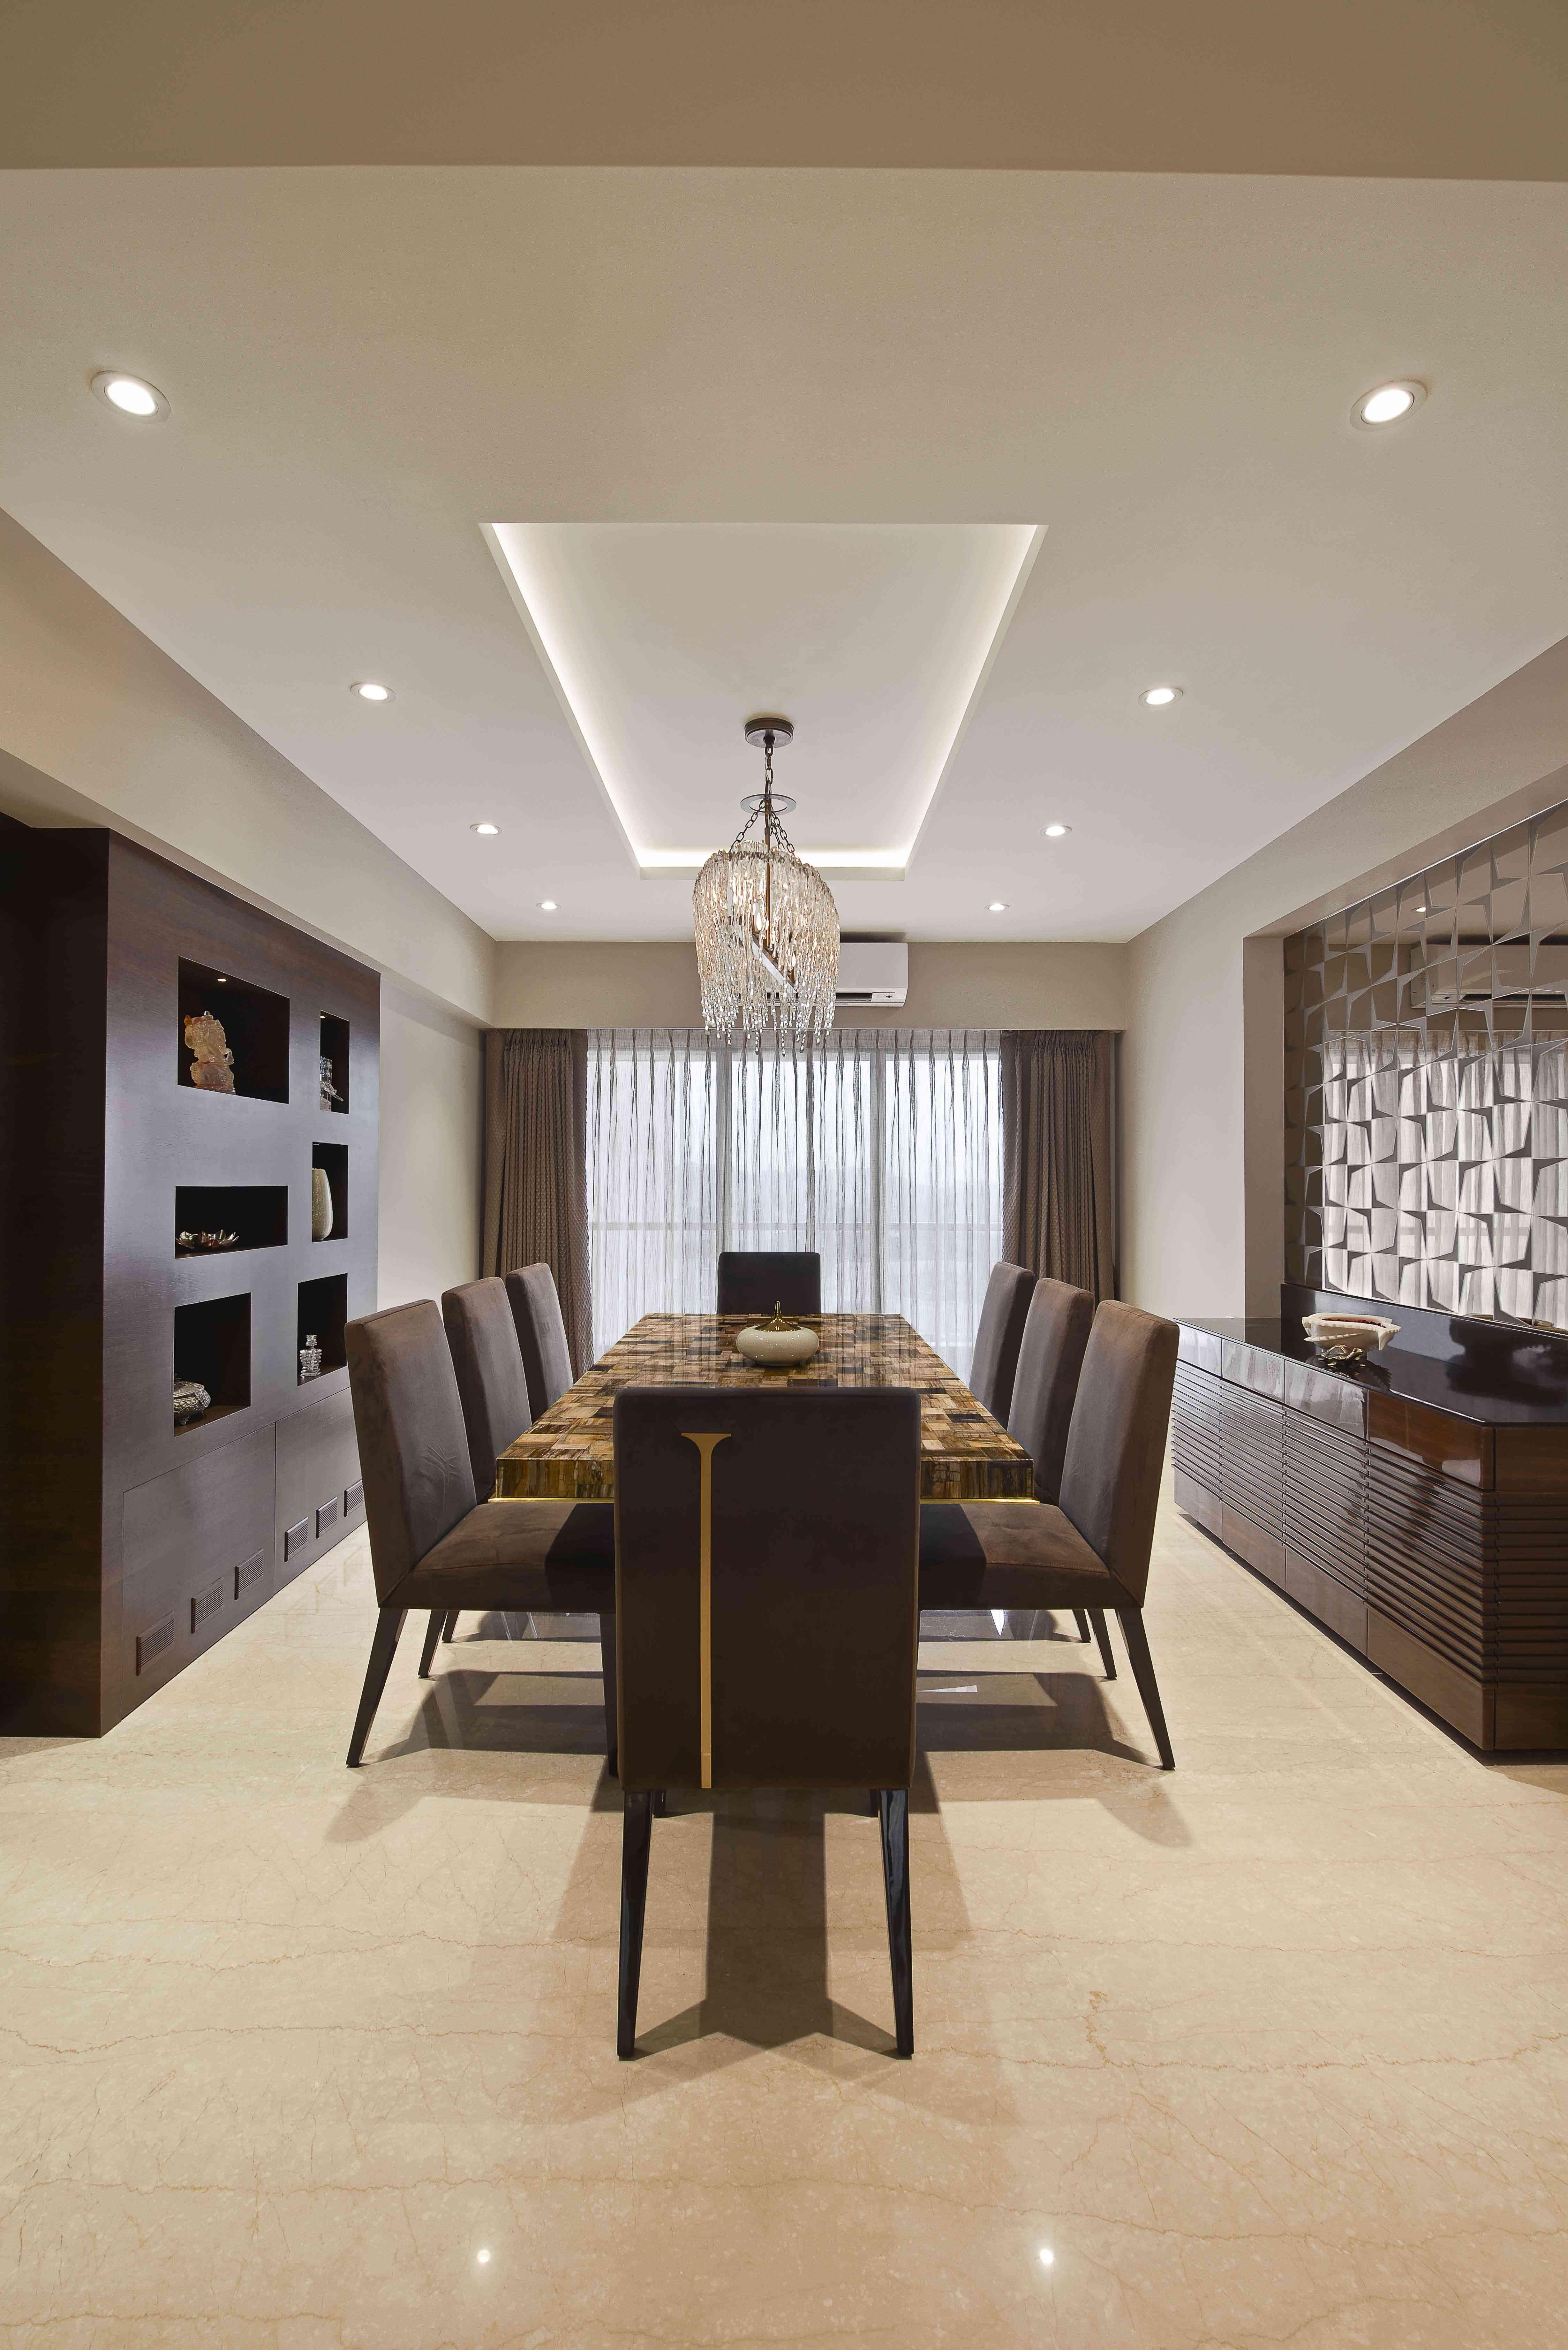 Dining room design - Milind Pai in 2019 | Living room ...